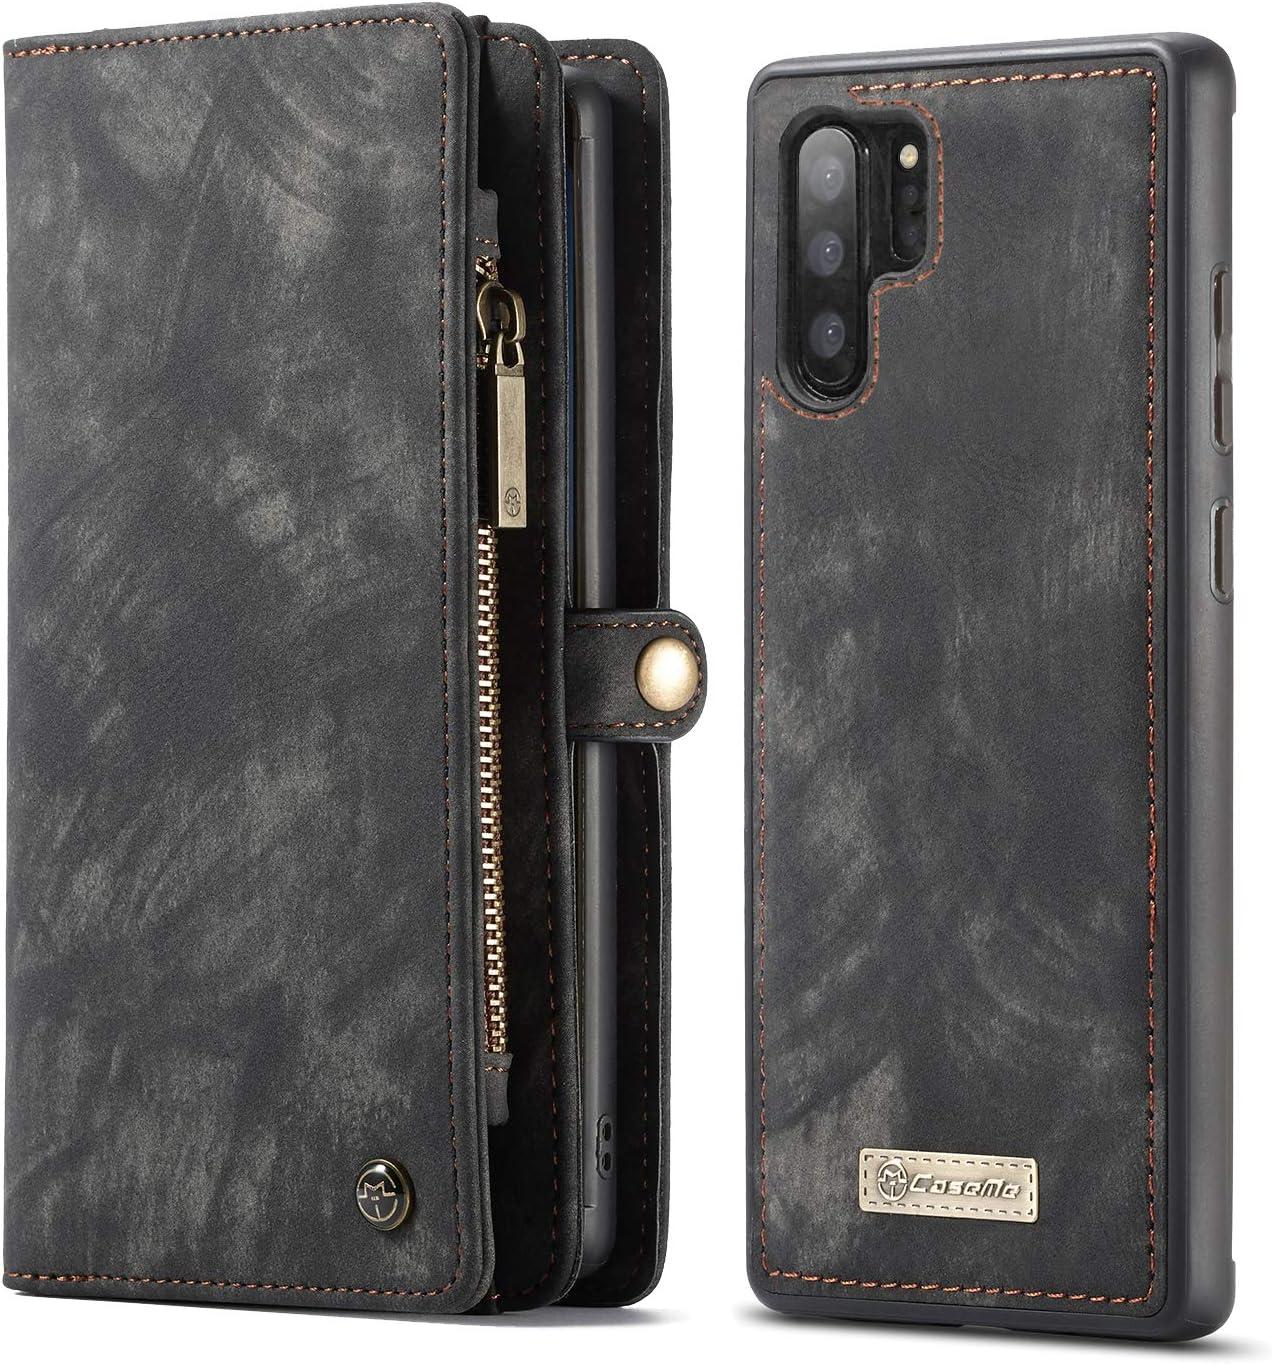 Simicoo Samsung Galaxy S10 Plus Leather Wallet Zipper Purse Detachable Card Slots Holder Flip Case Magnetic Handle Wrist Strap Shockproof Pocket Wallet Handbag for Galaxy S10 Plus (Black, S10 Plus)